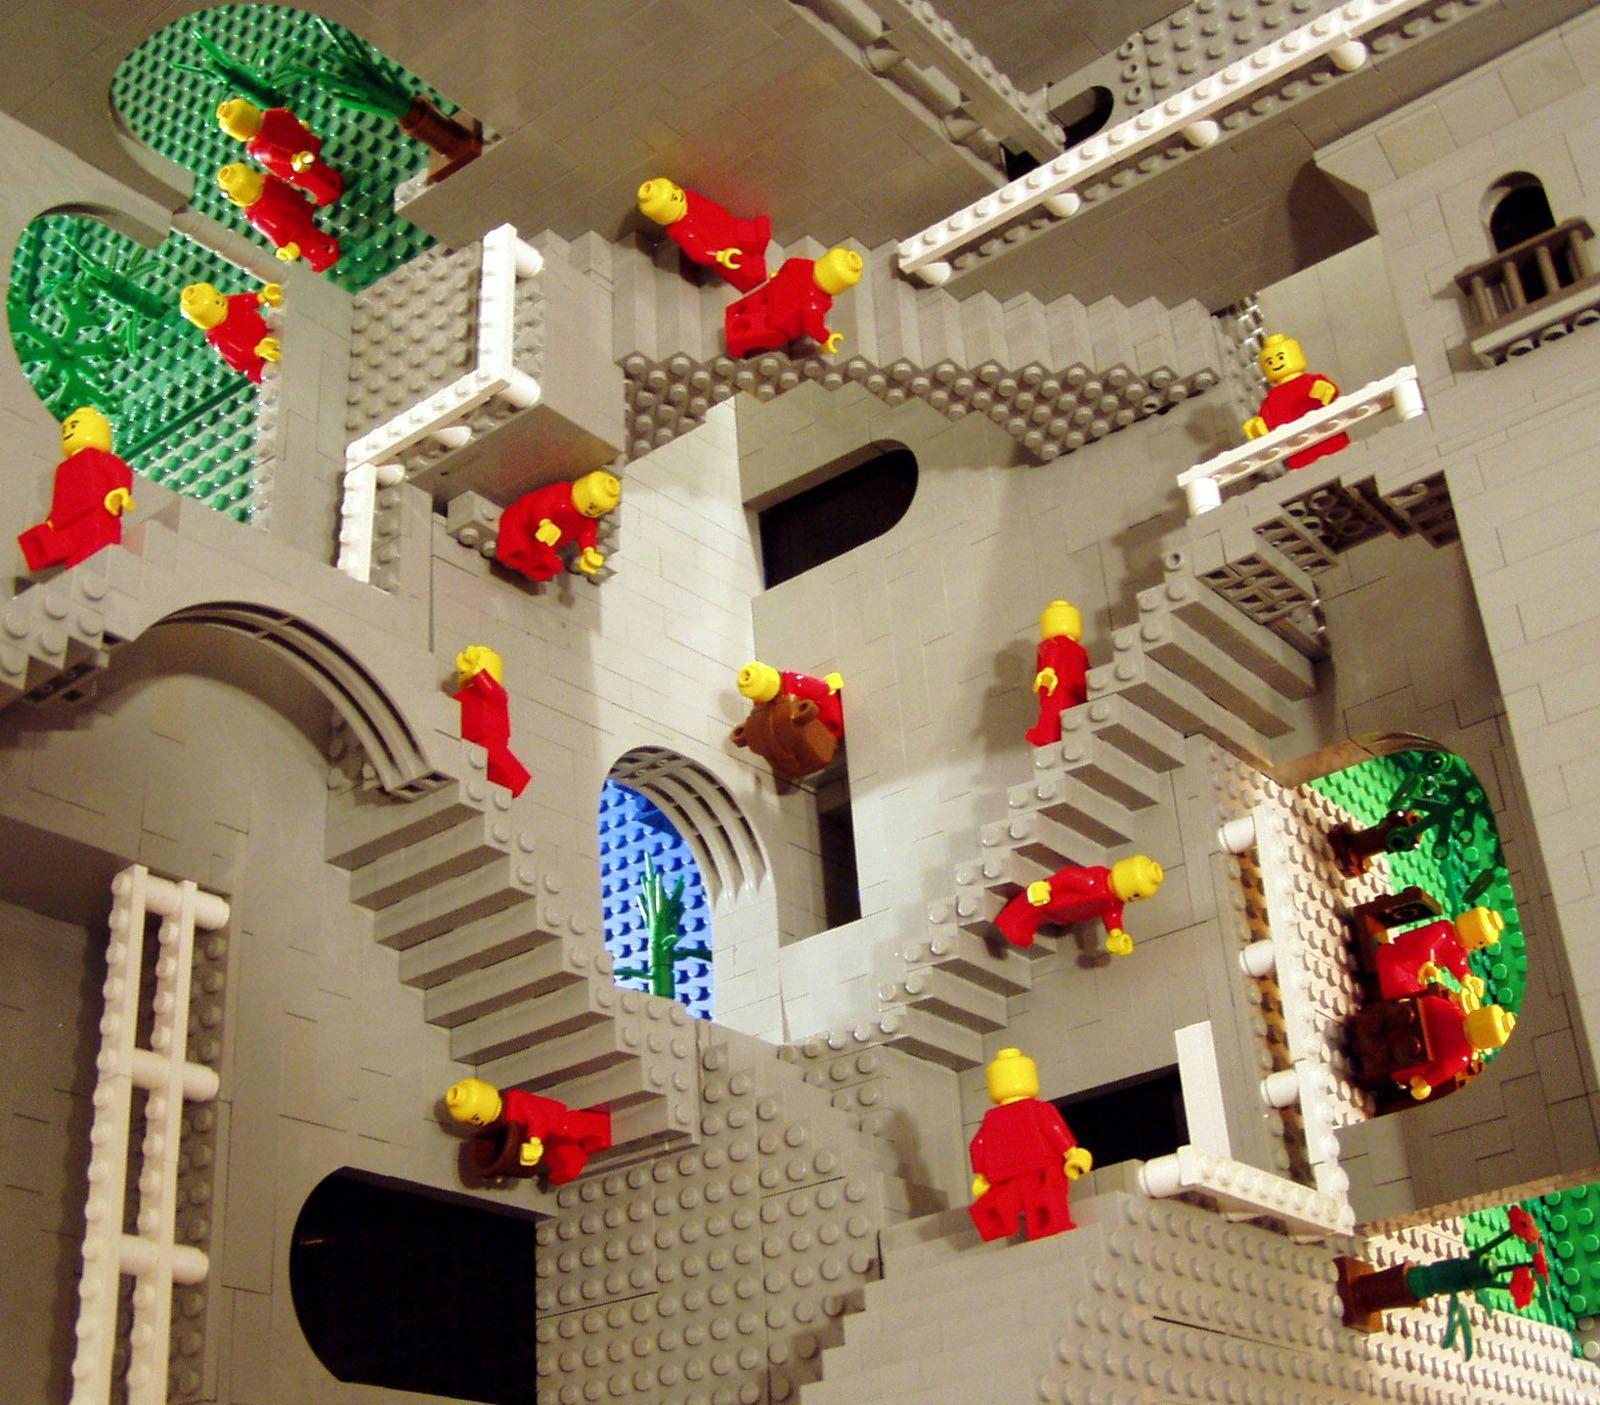 If M. C. Escher had LEGO